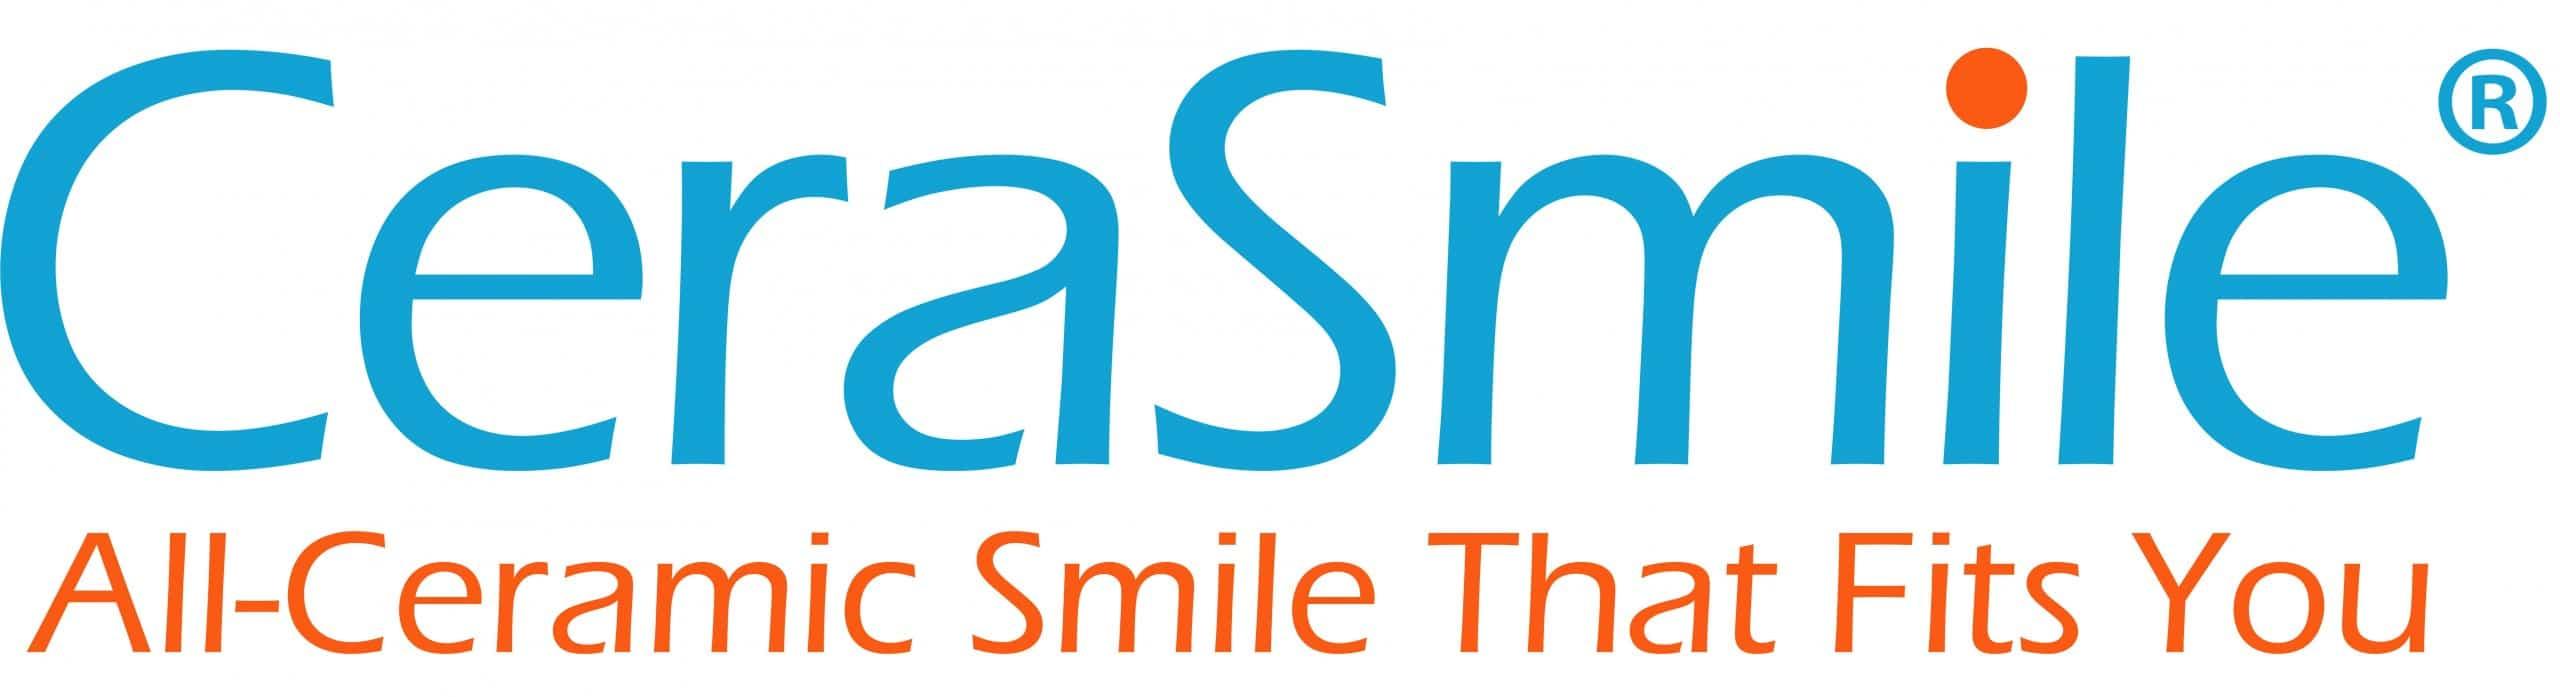 CeraSmile® Logo